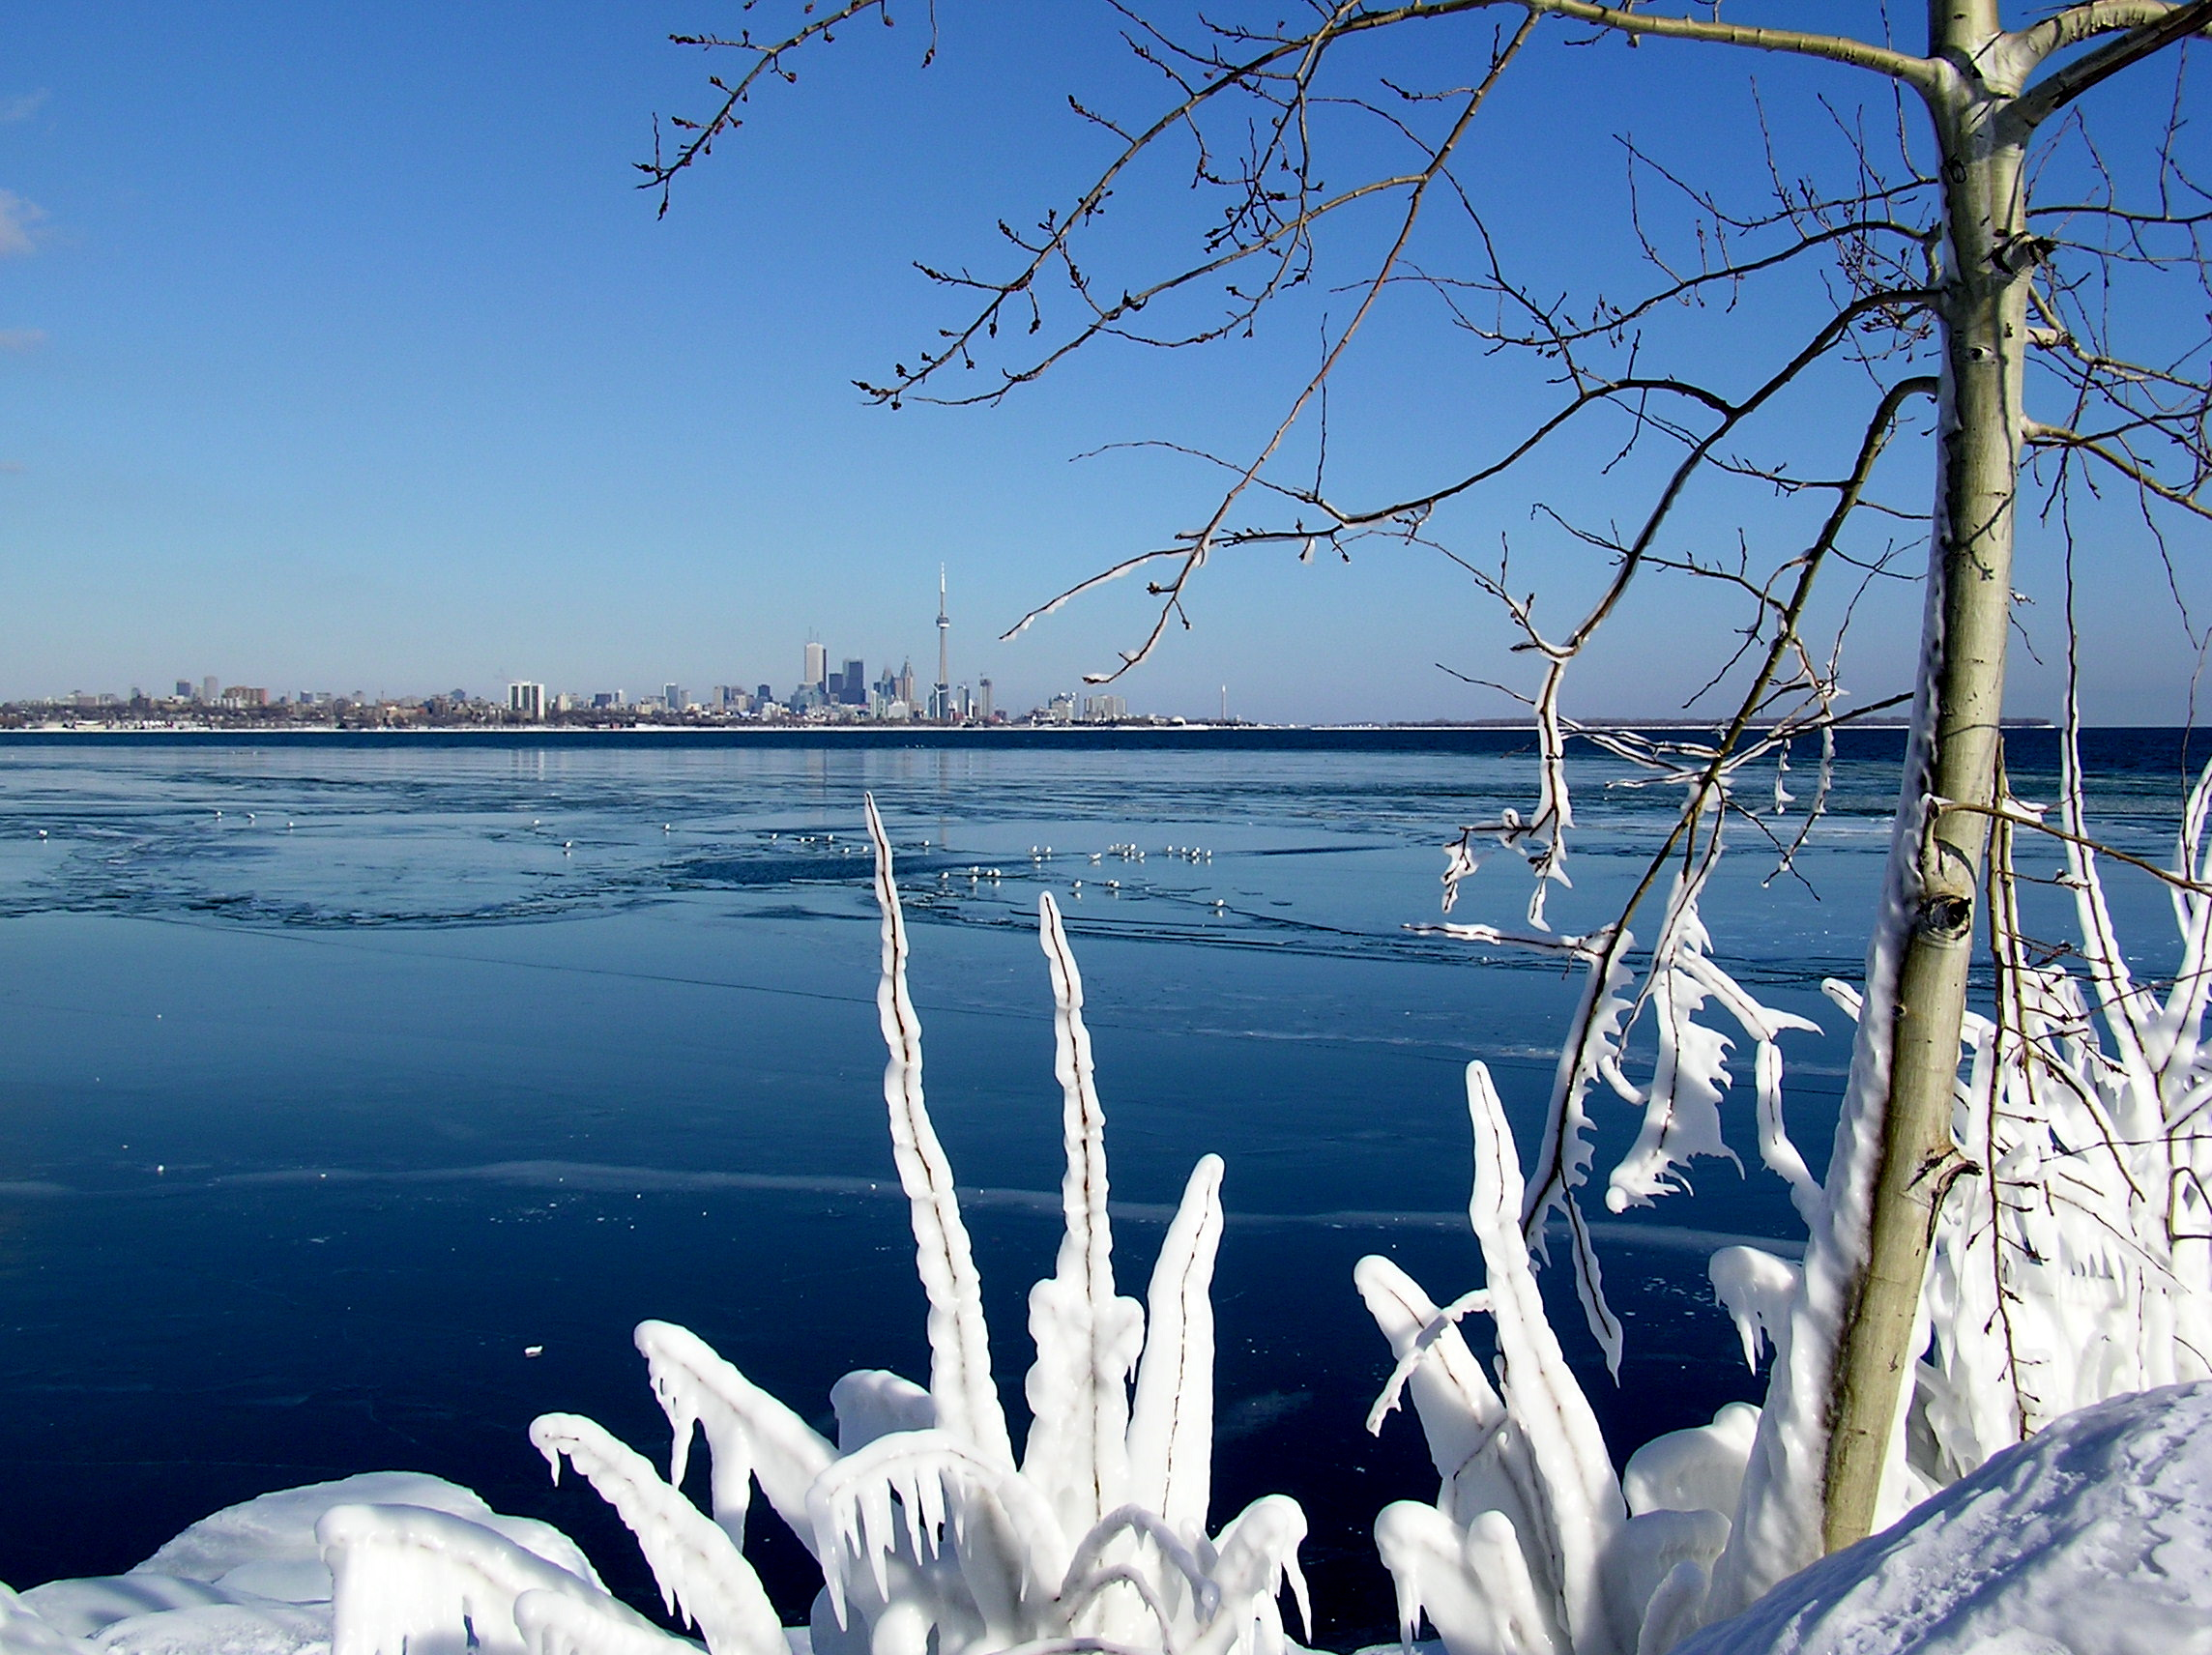 Kanada - Page 3 Frozen_lake_toronto